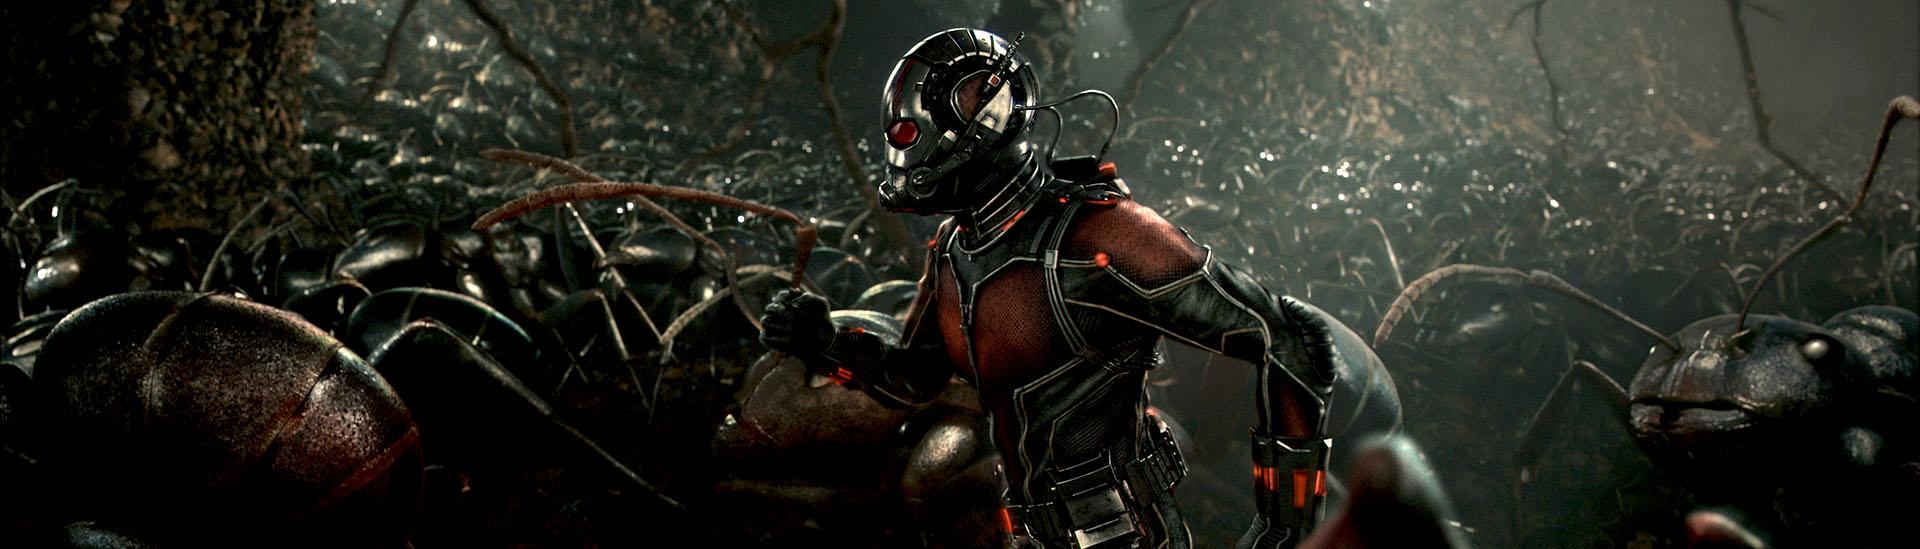 Baner filmu 'Ant-Man'